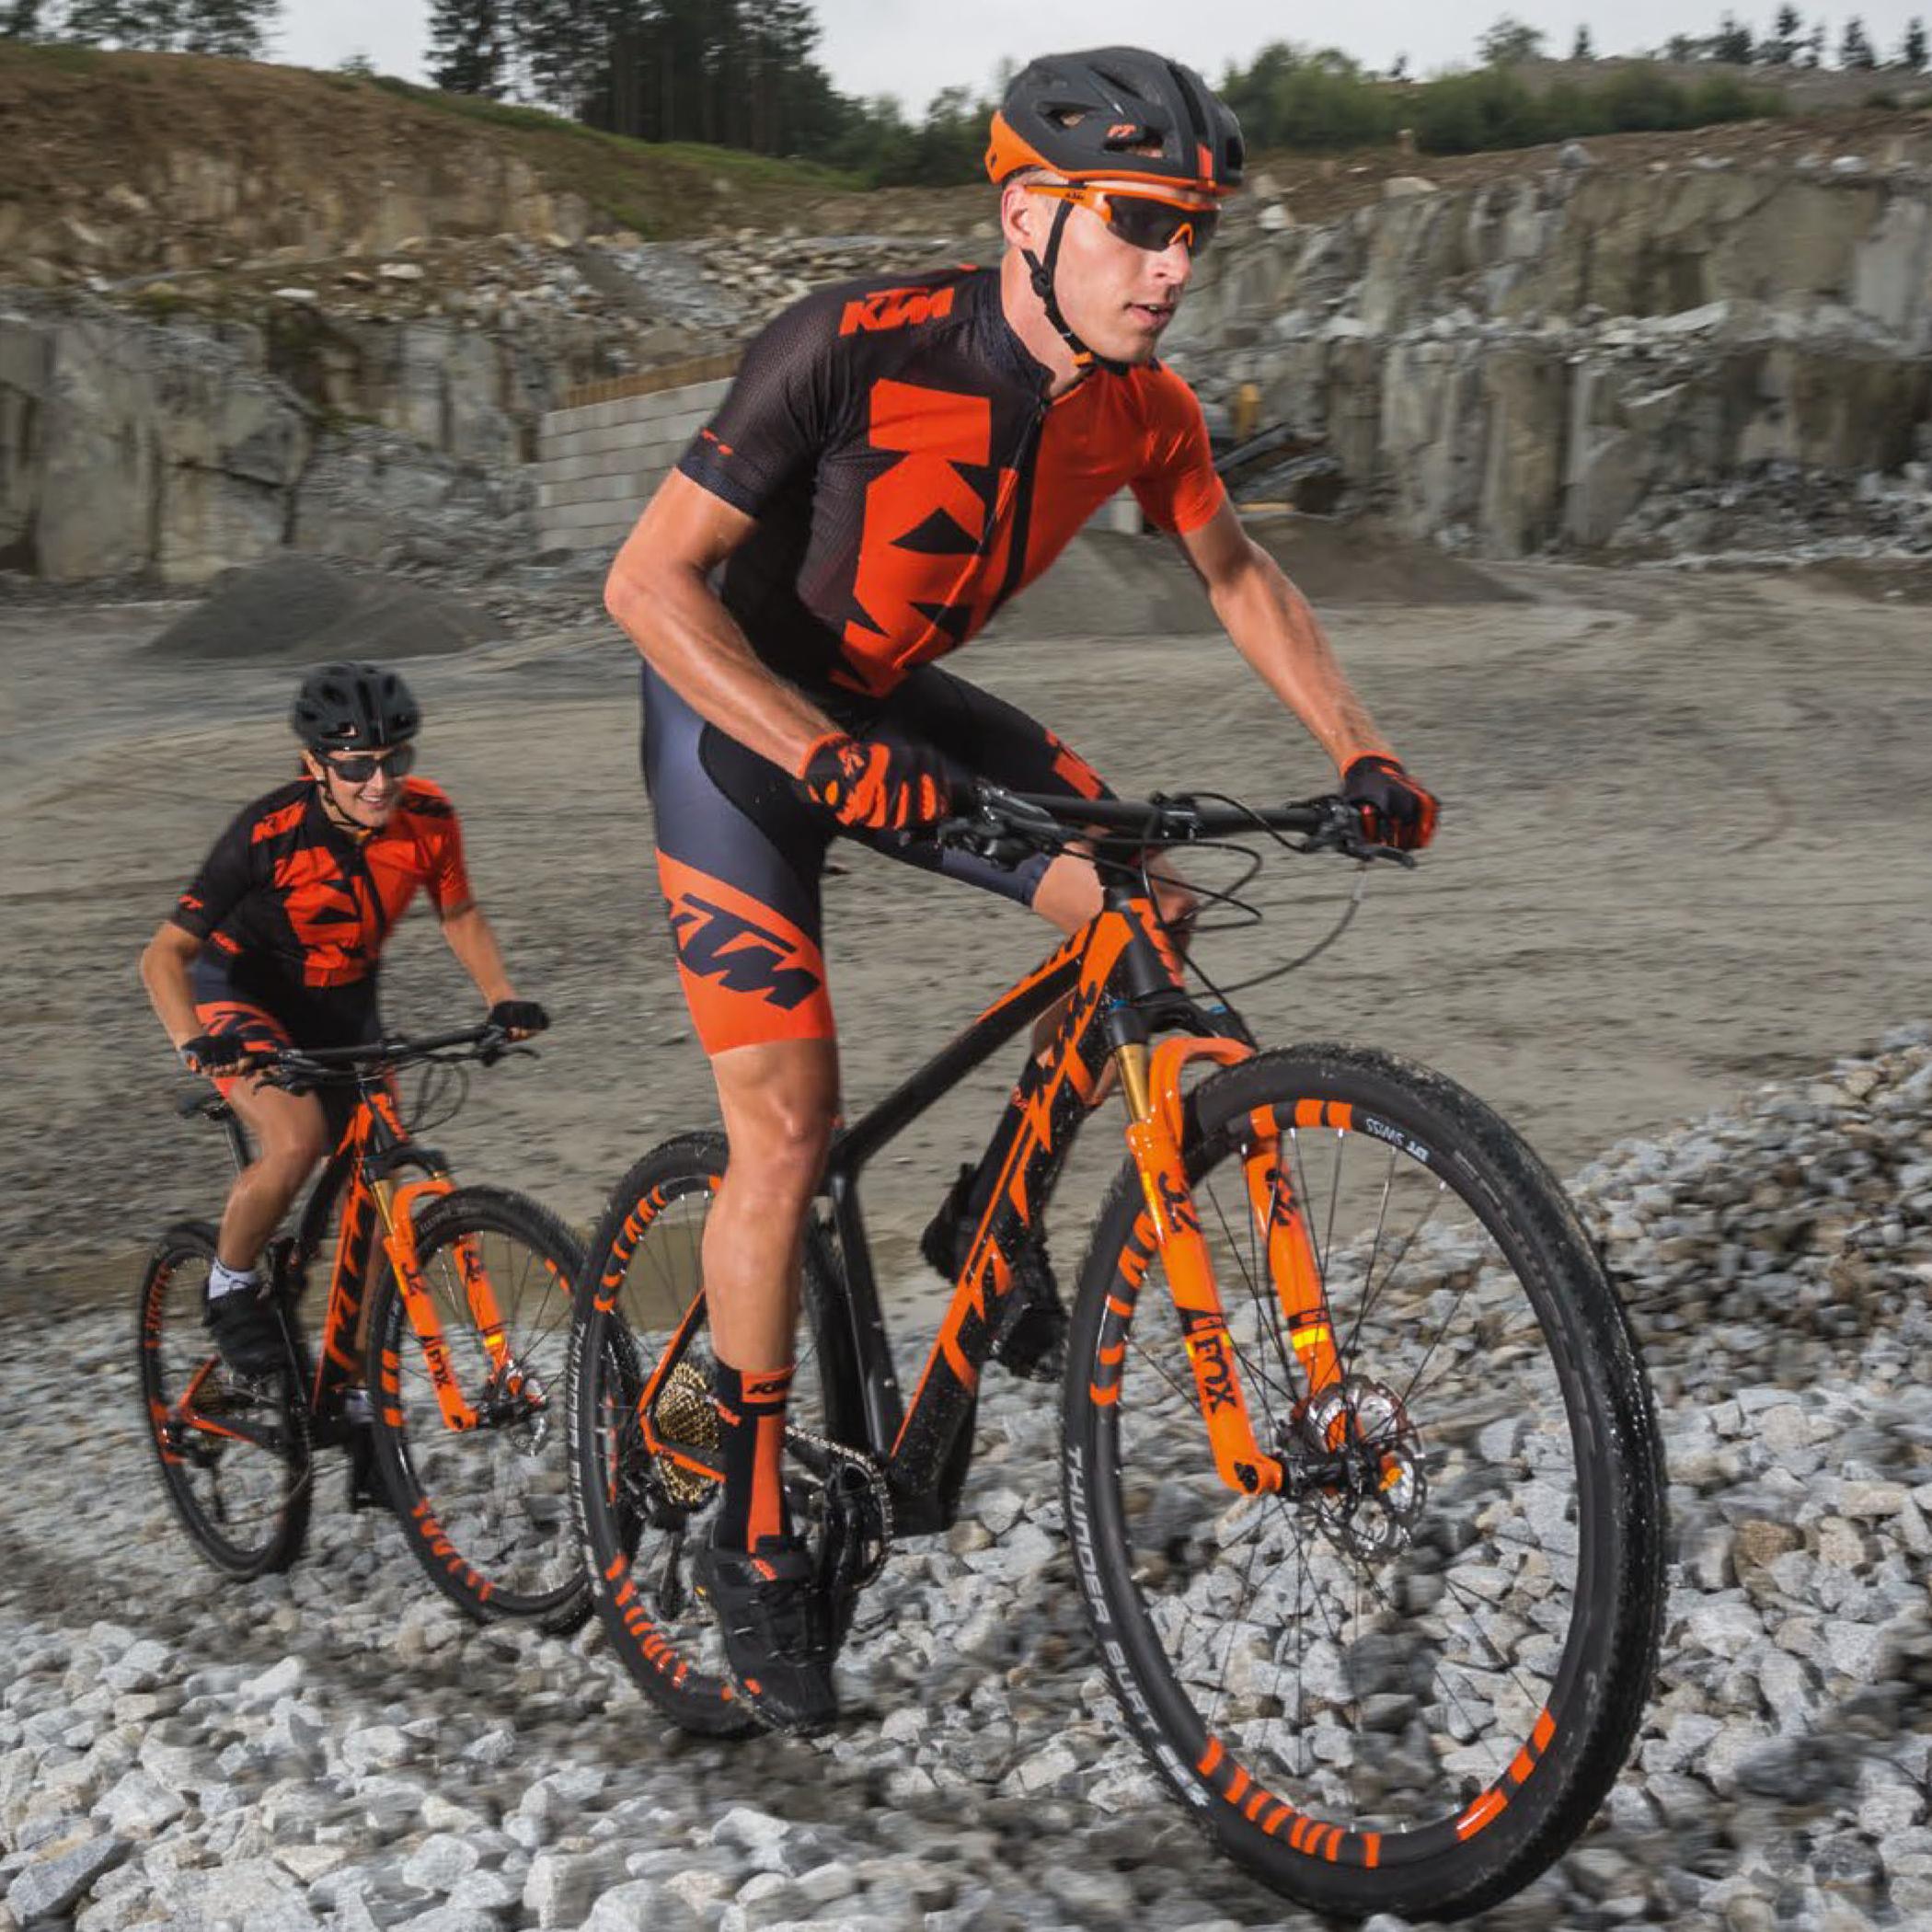 KTM Bike Duo